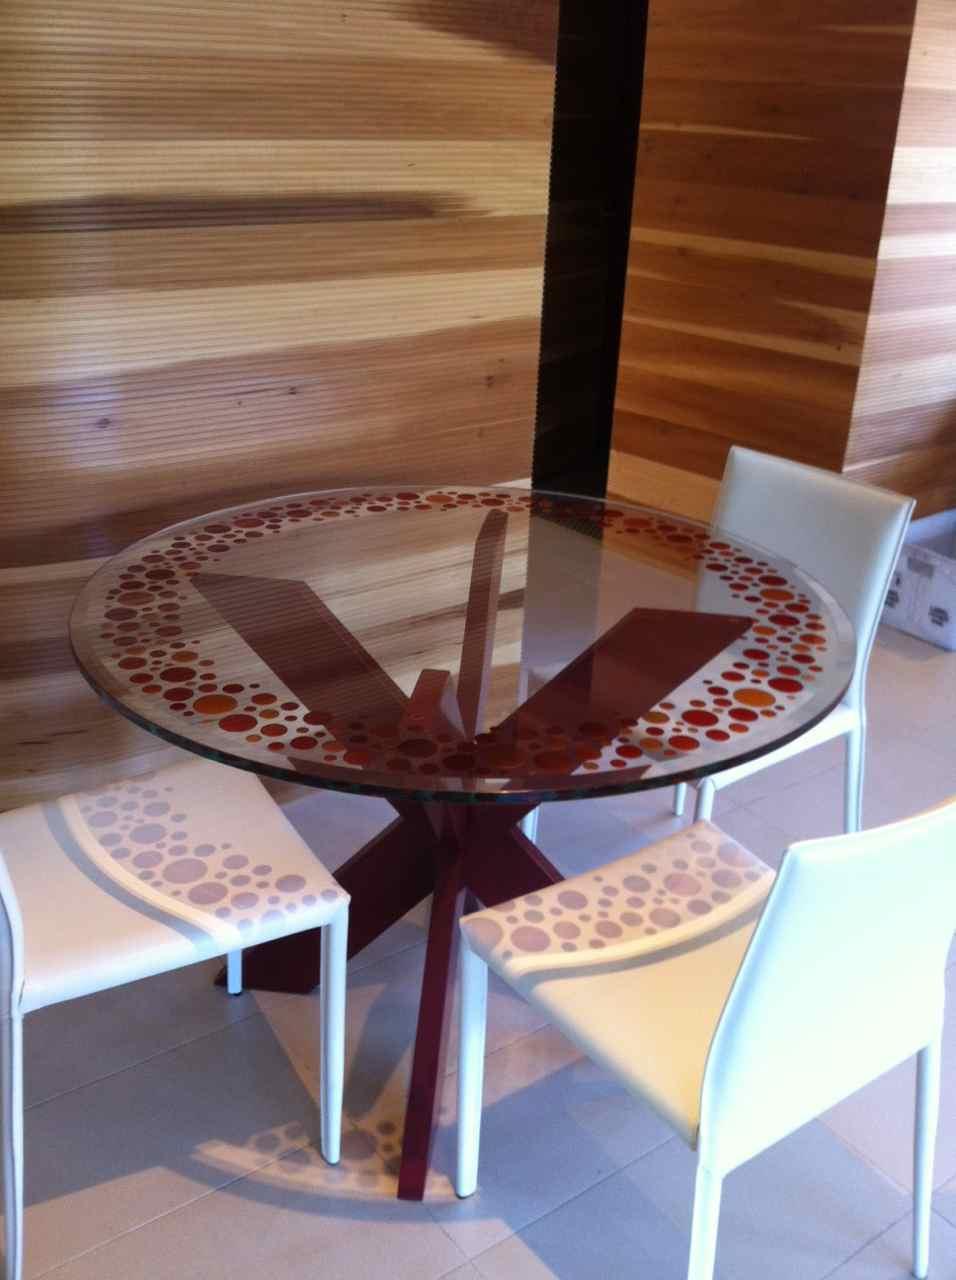 Table Geometric Circles Bubbly   2